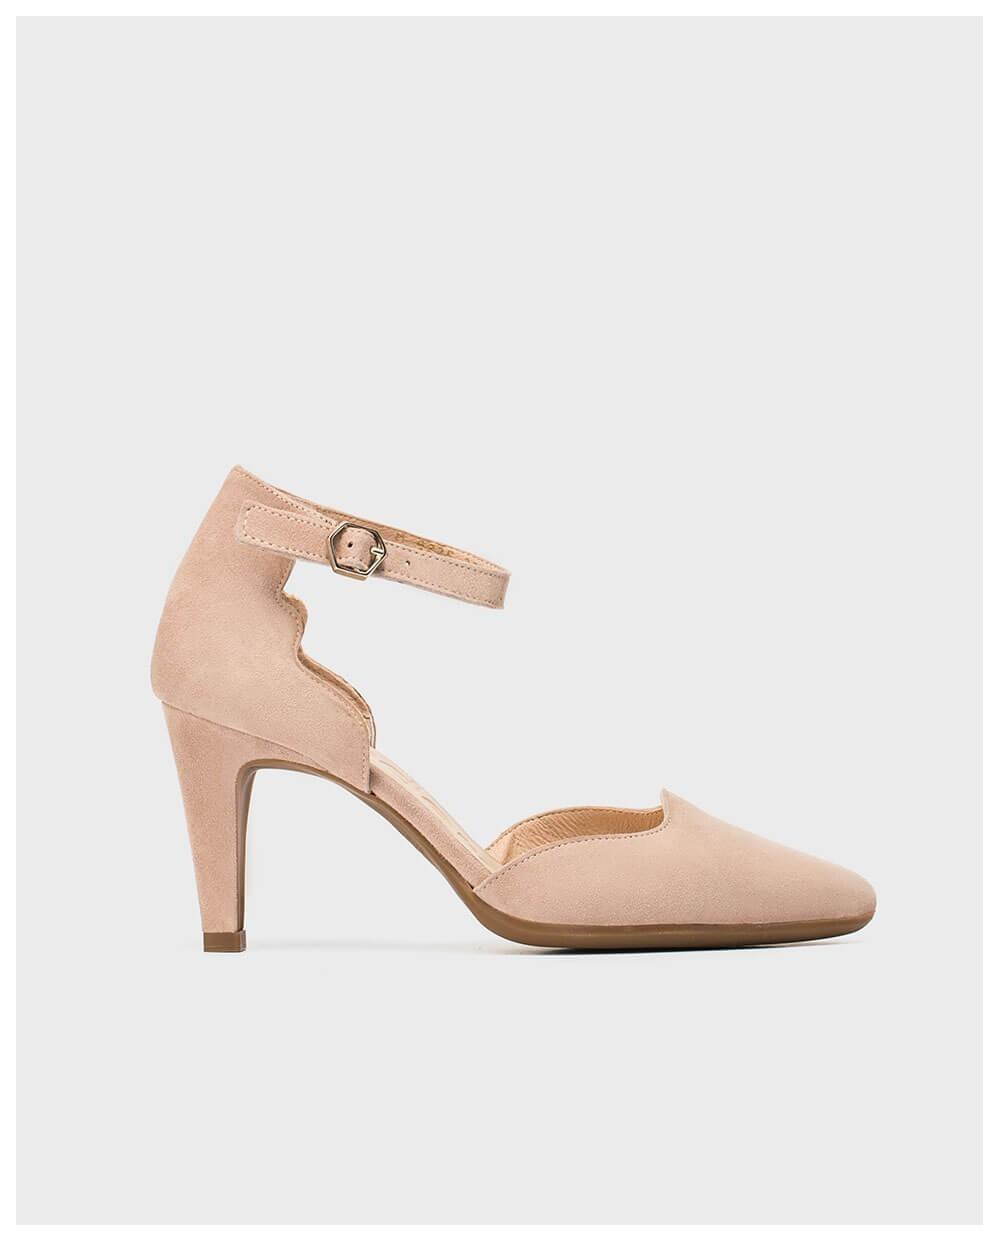 Wonders-Women-High heeled wave shoe